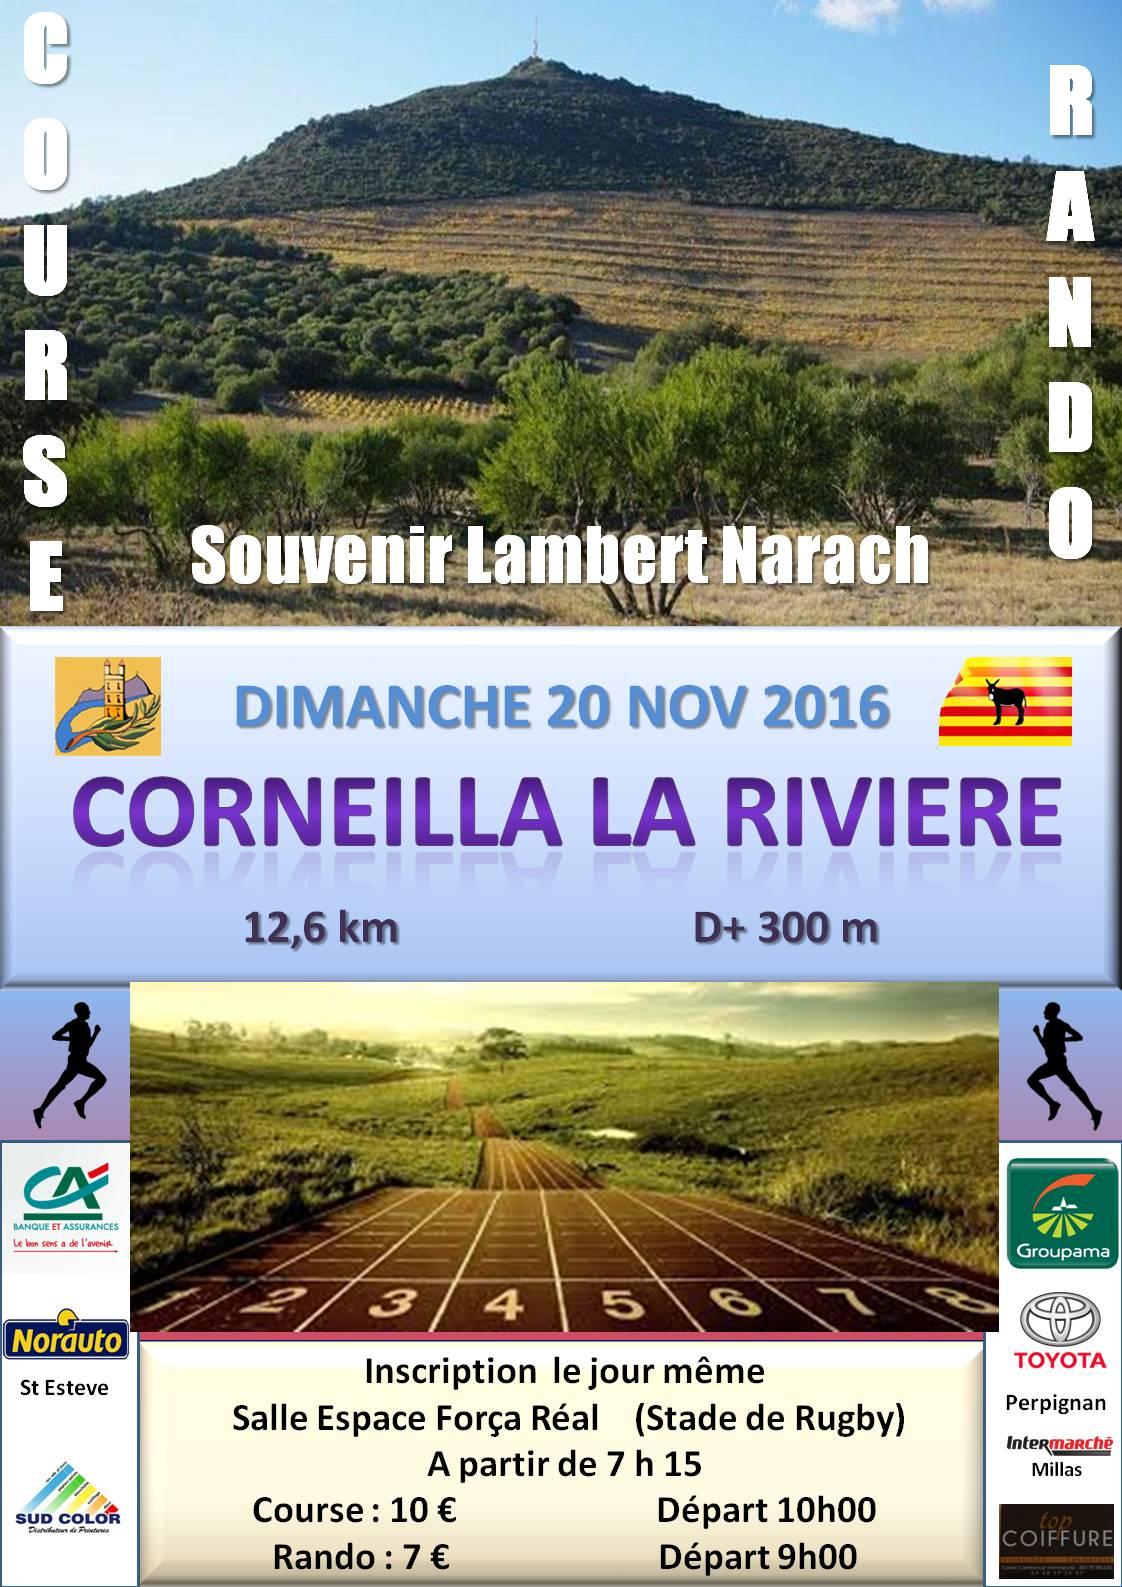 Corneilla